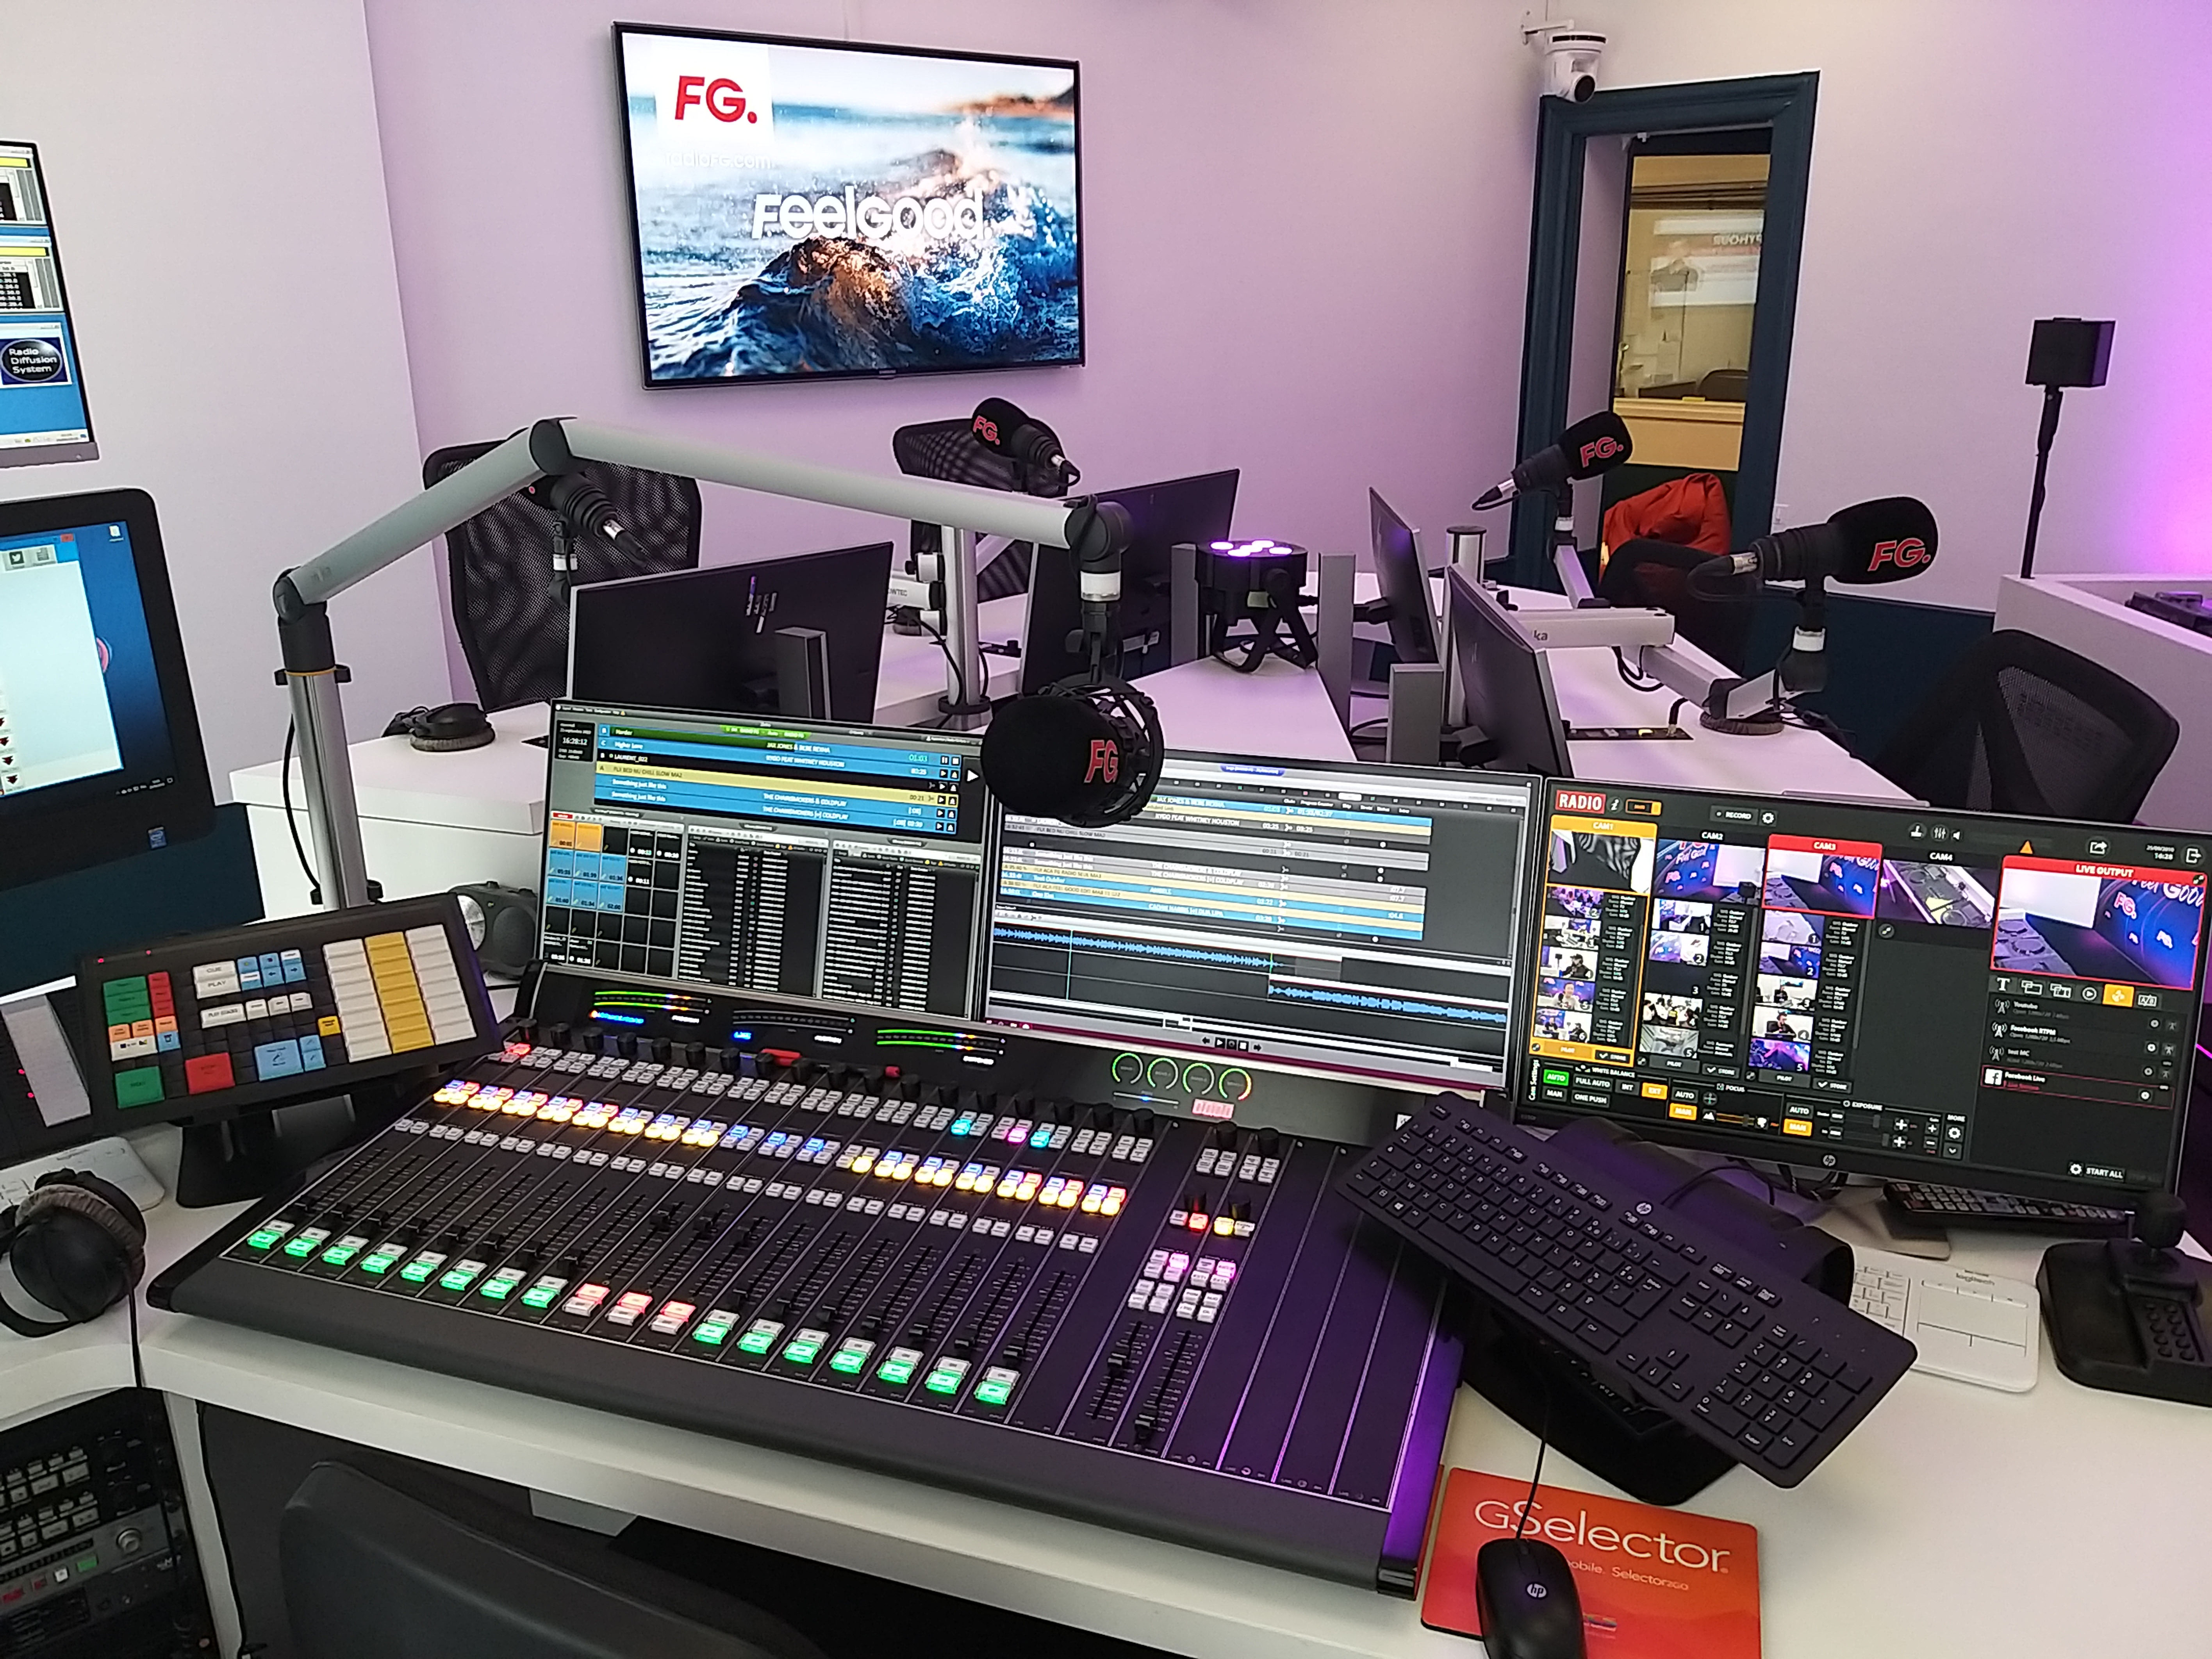 La console LXE Wheatstone dans son environnement avec ZETTA RCS. Photo Sylvain Ferey, Radio FG